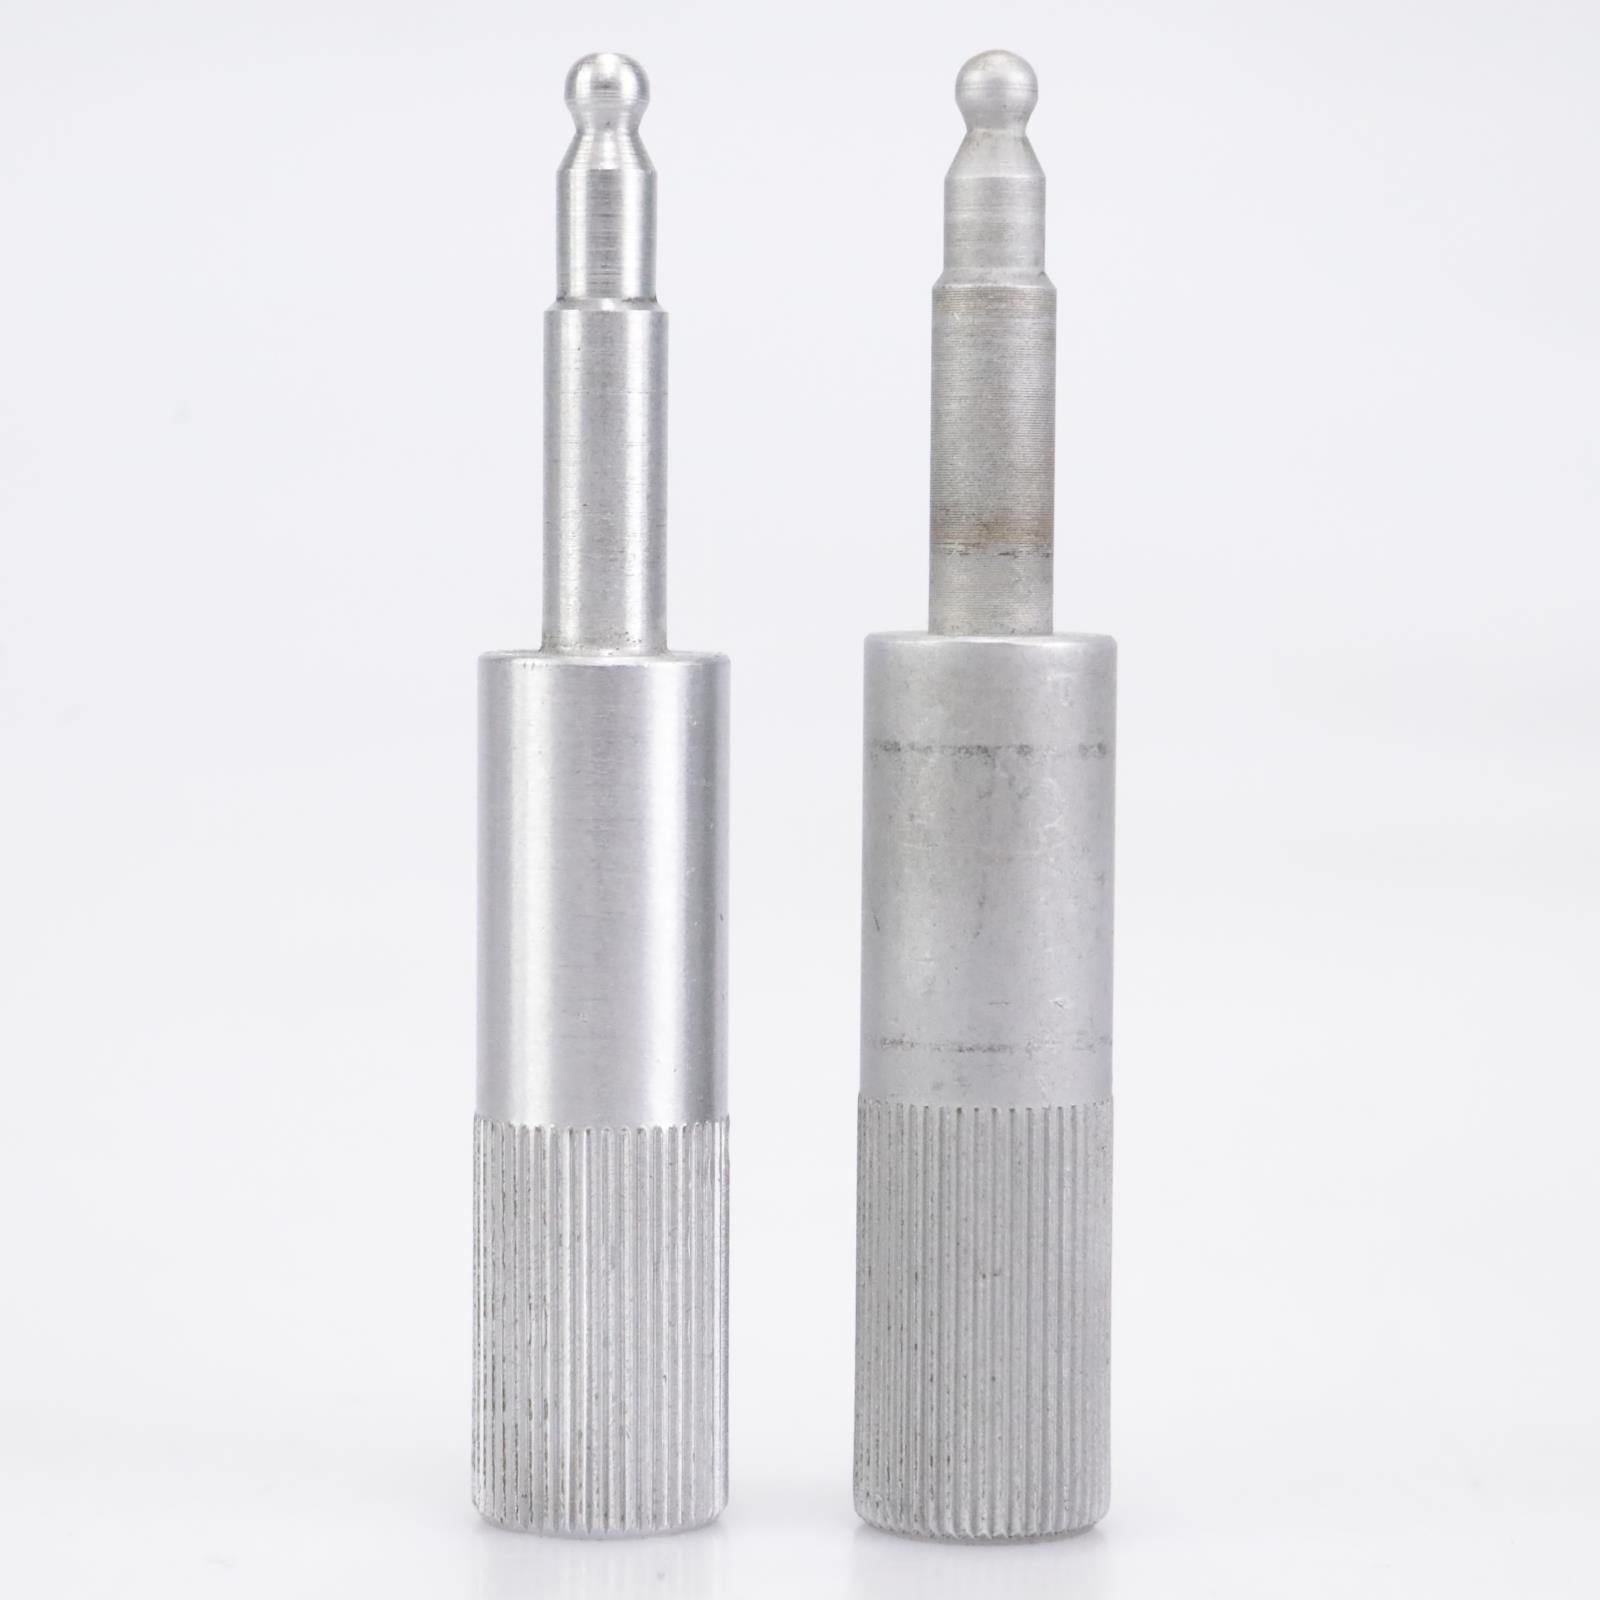 "Vertigo TRS 1/4"" Burnisher & TRS 1/4"" Injector Patchbay Cleaning Tools #43355"